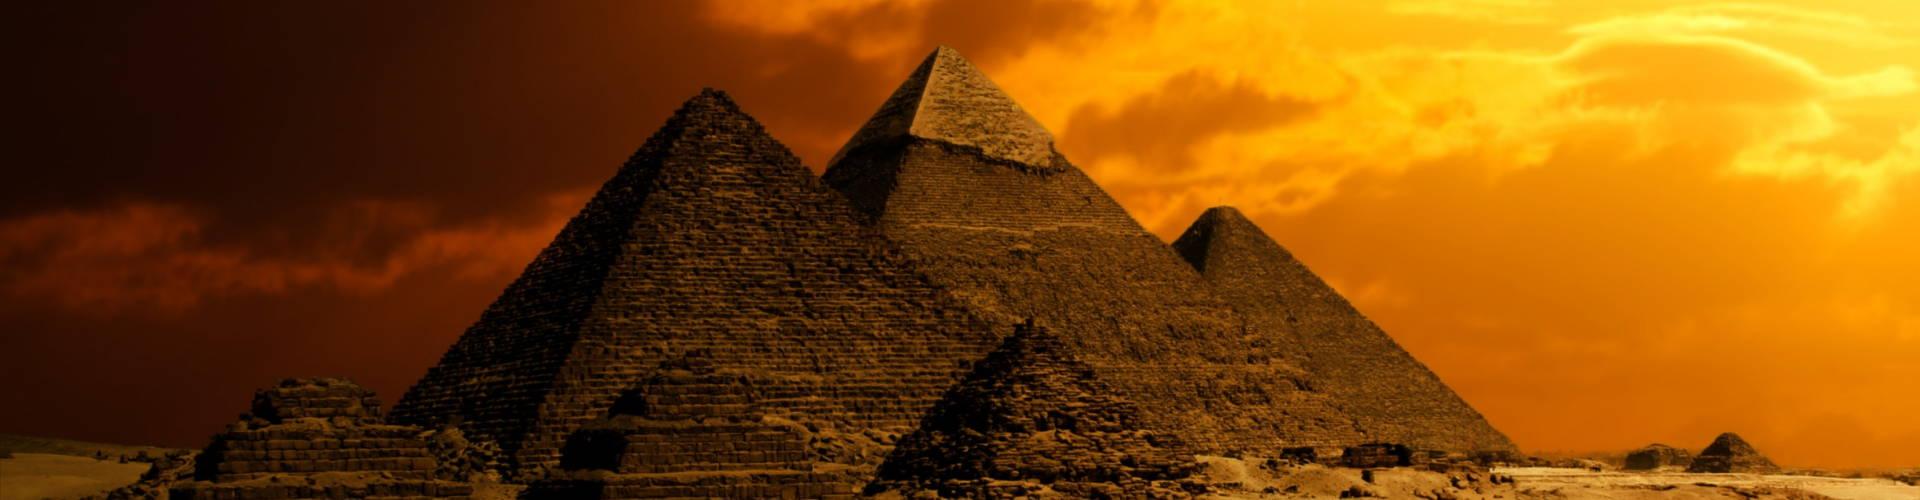 egypt incense